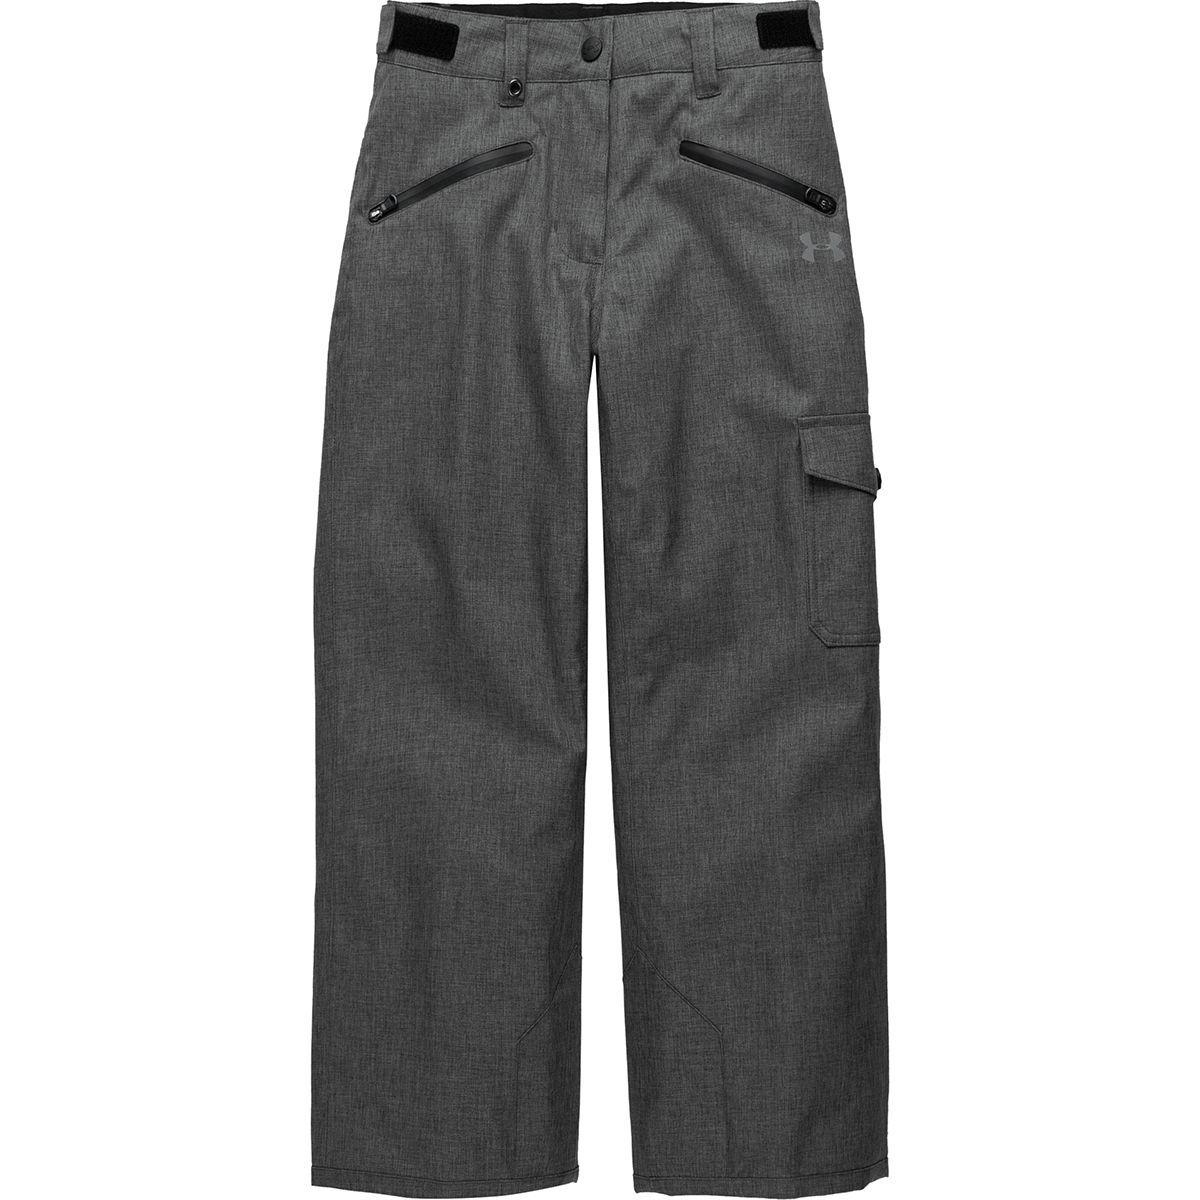 Under Armour Heather Swiftbrook Insulated Pant - Girls'